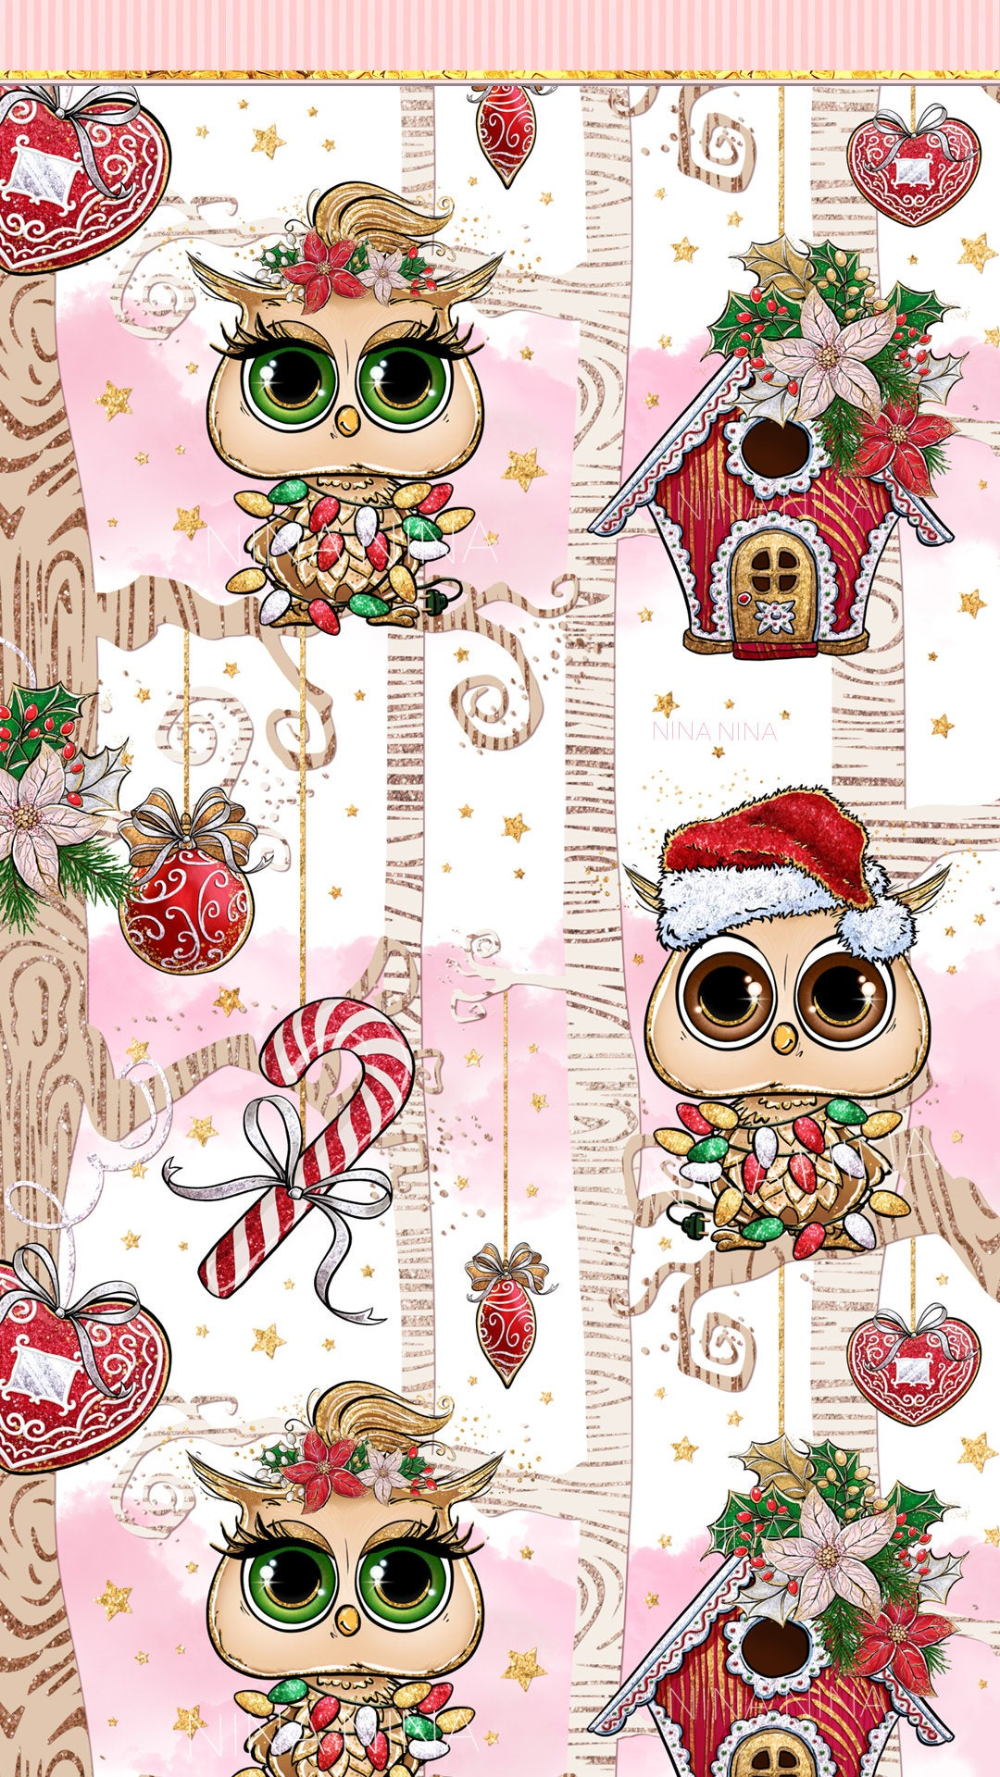 Owl Christmas Iphone Wallpaper Owl Wallpaper Iphone Cute Owls Wallpaper Owl Background